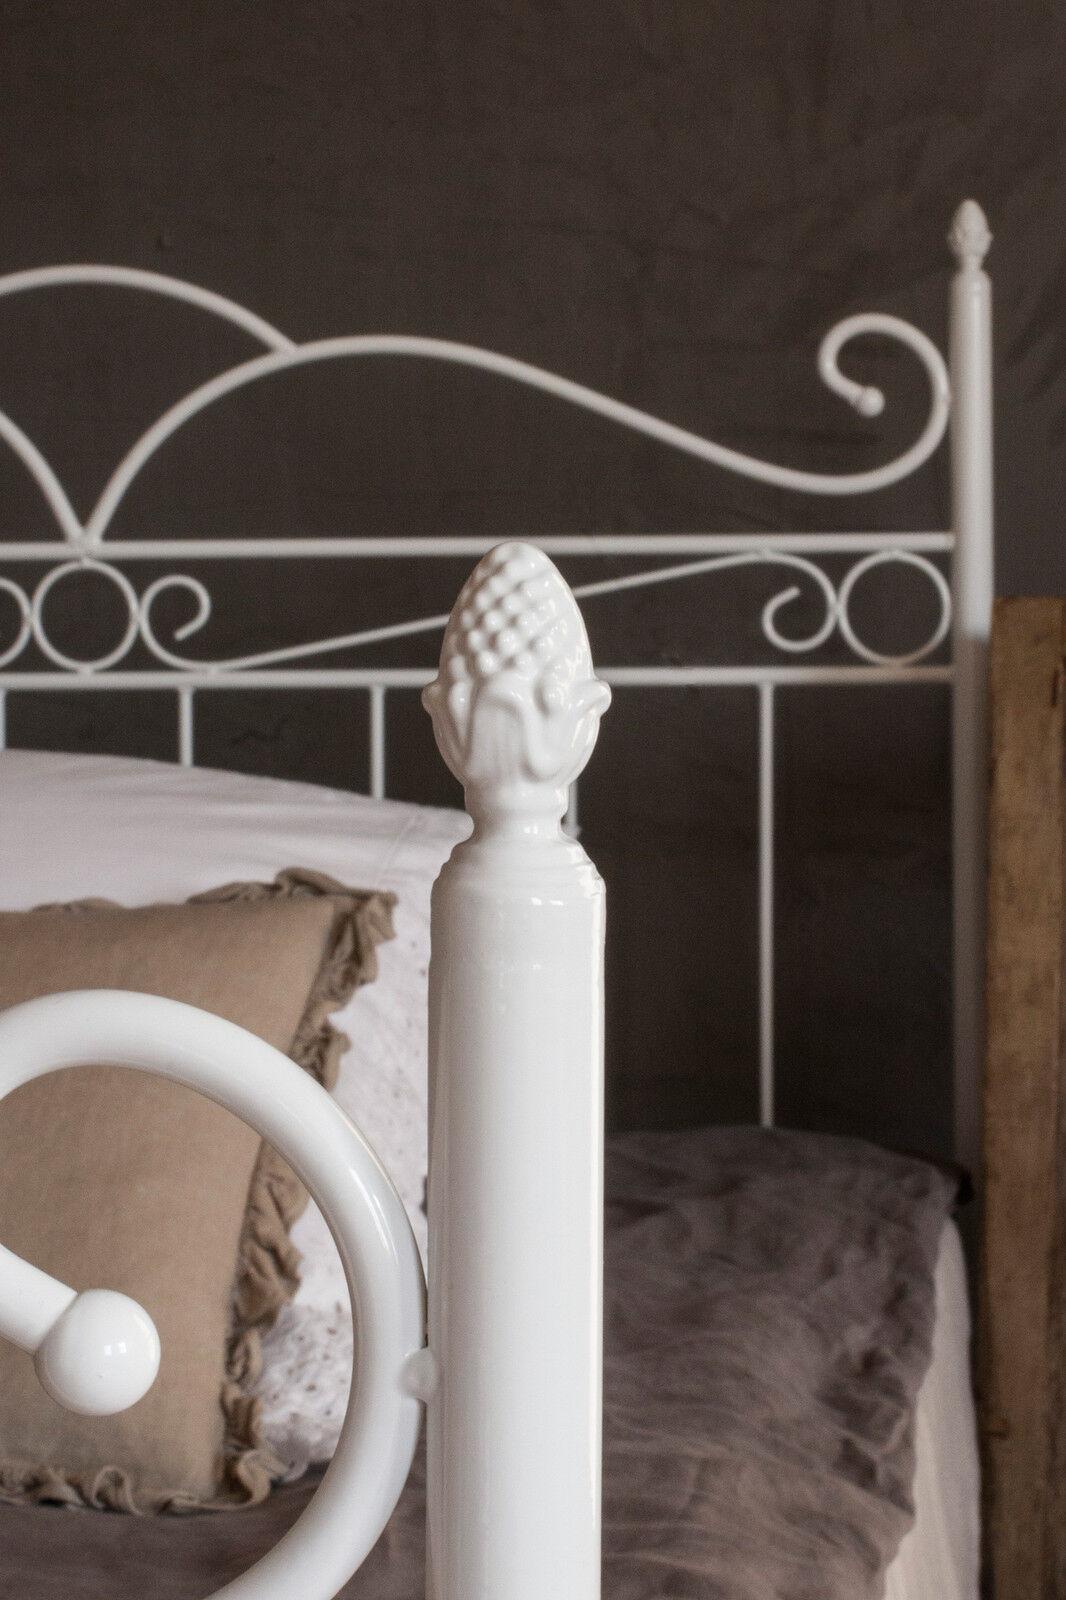 vintage flair metallbett 160x200 in weiss ecru oder schwarz inkl lattenrost eur 275 00. Black Bedroom Furniture Sets. Home Design Ideas